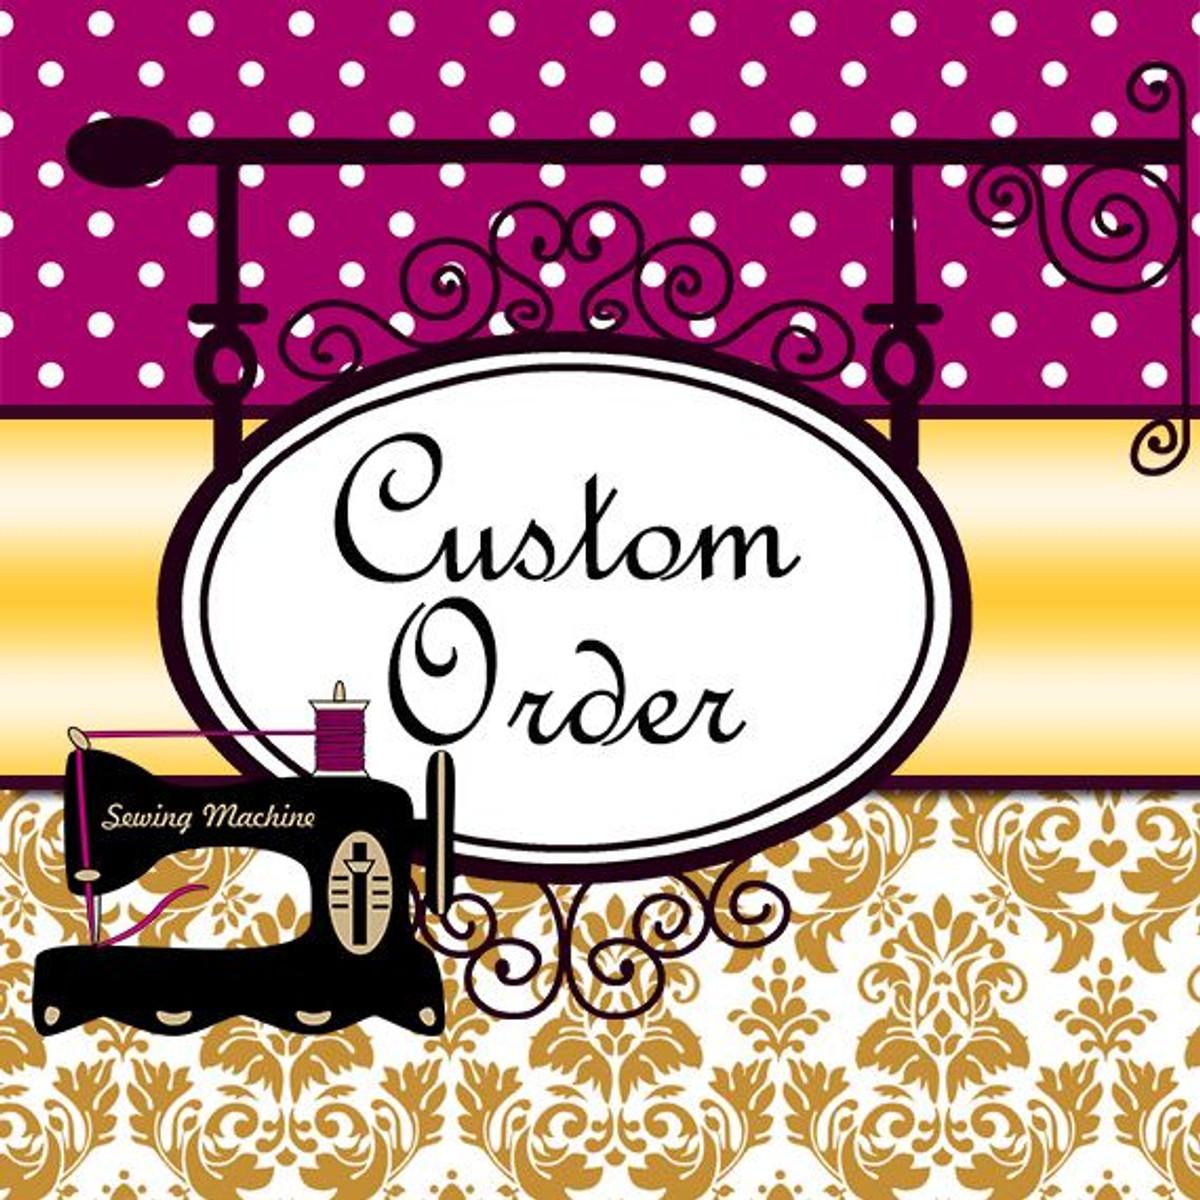 Custom Wedding Dress for Yvonne